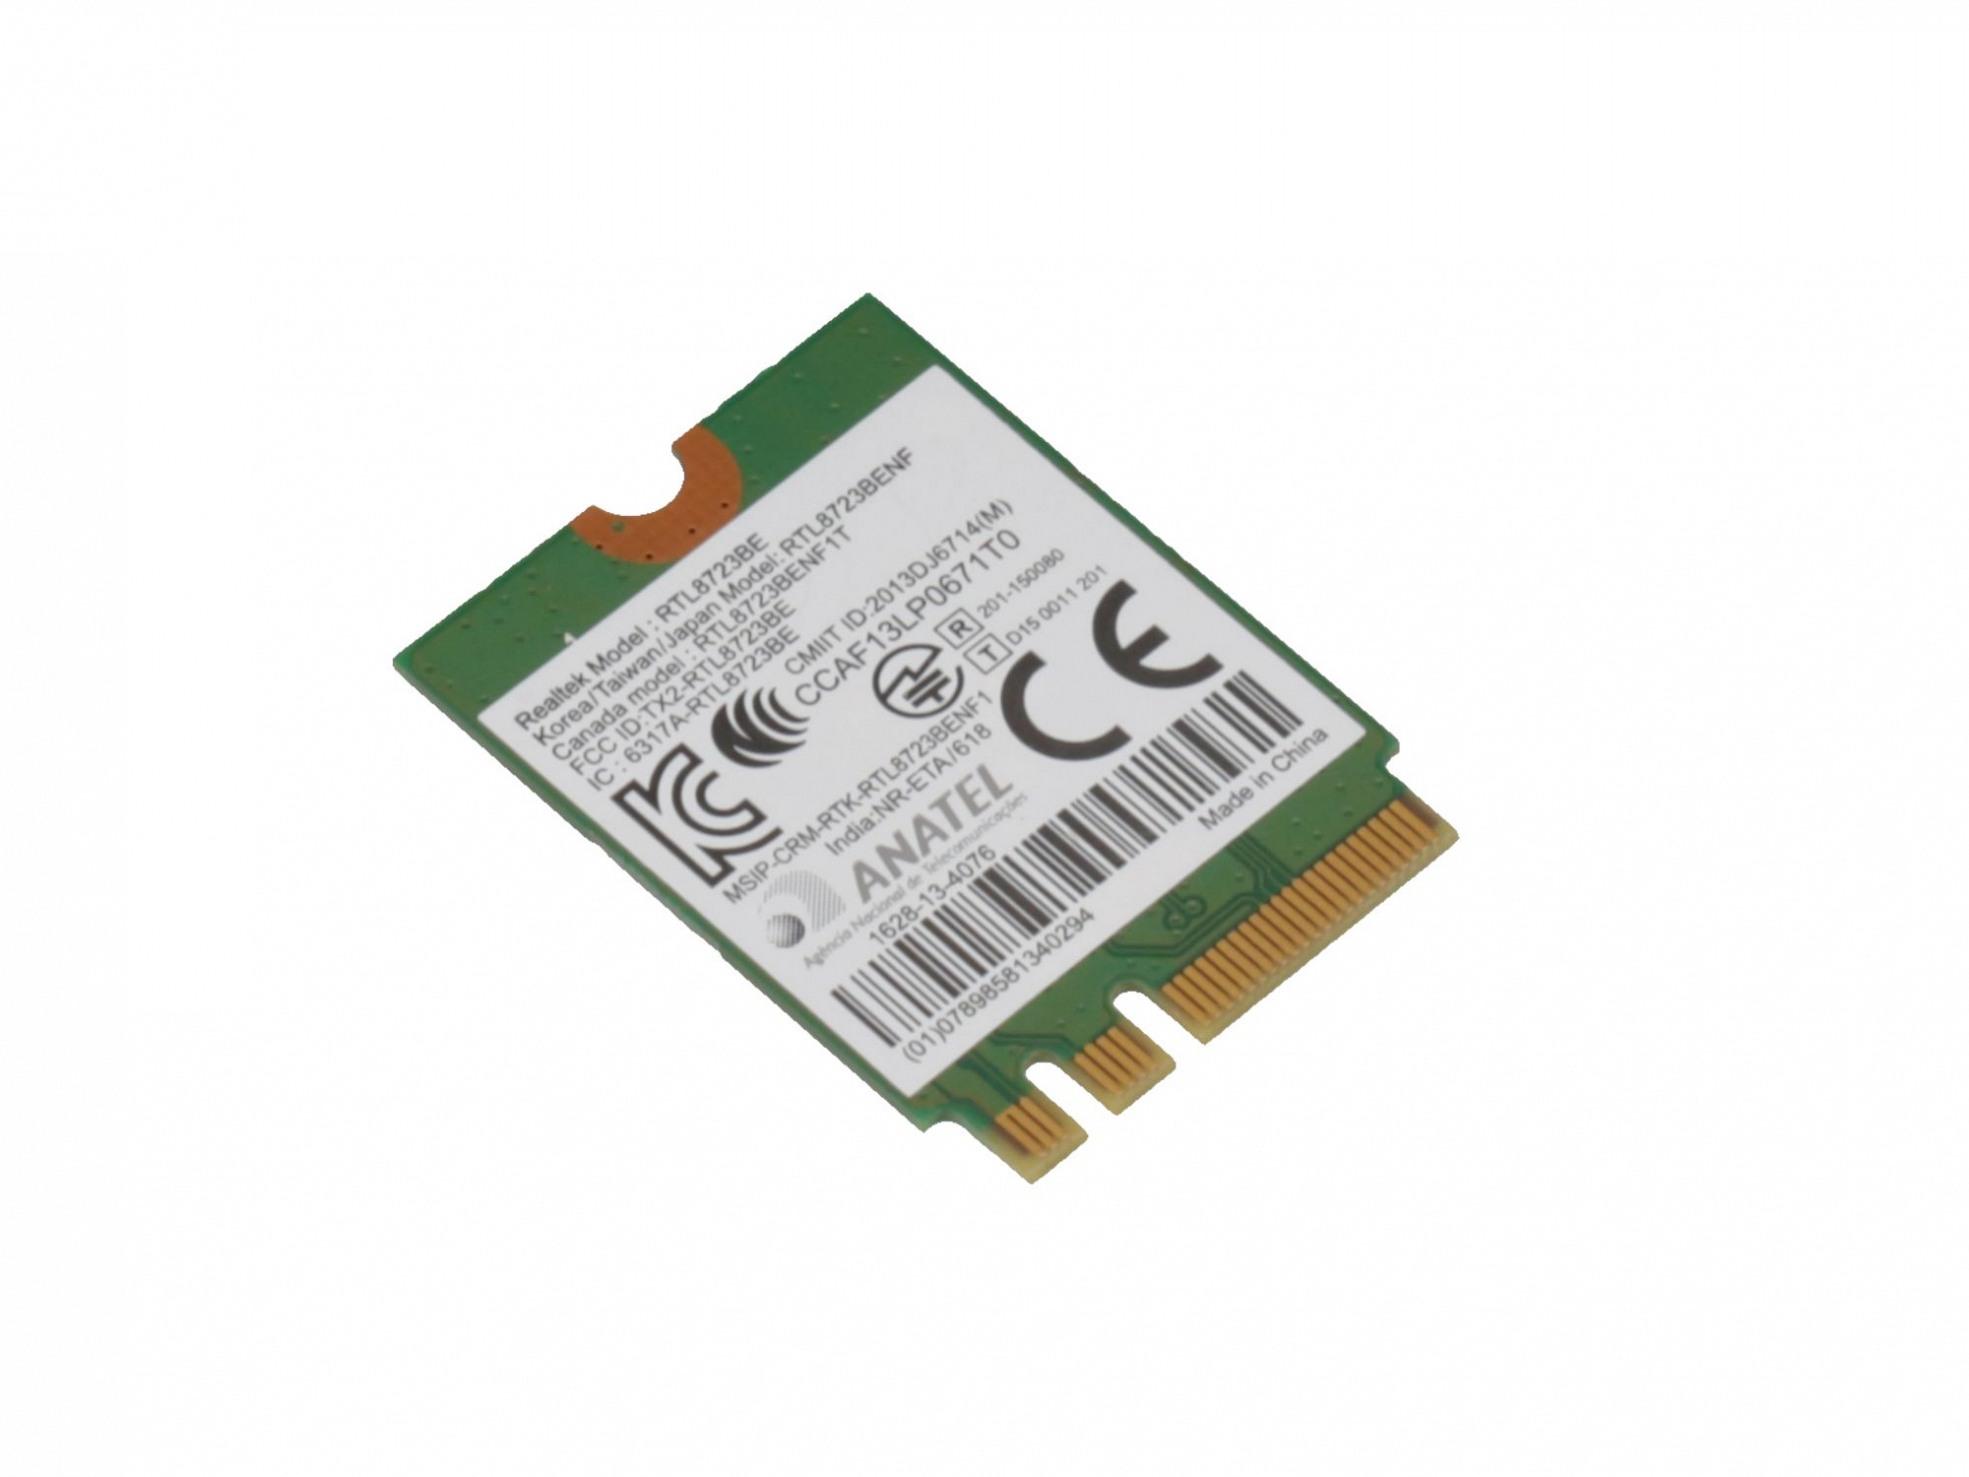 Asus 0C011-00061E00 WLAN/Blutooth Karte WLAN: 802.11B/G/N + Bluetooth 4.0 Original